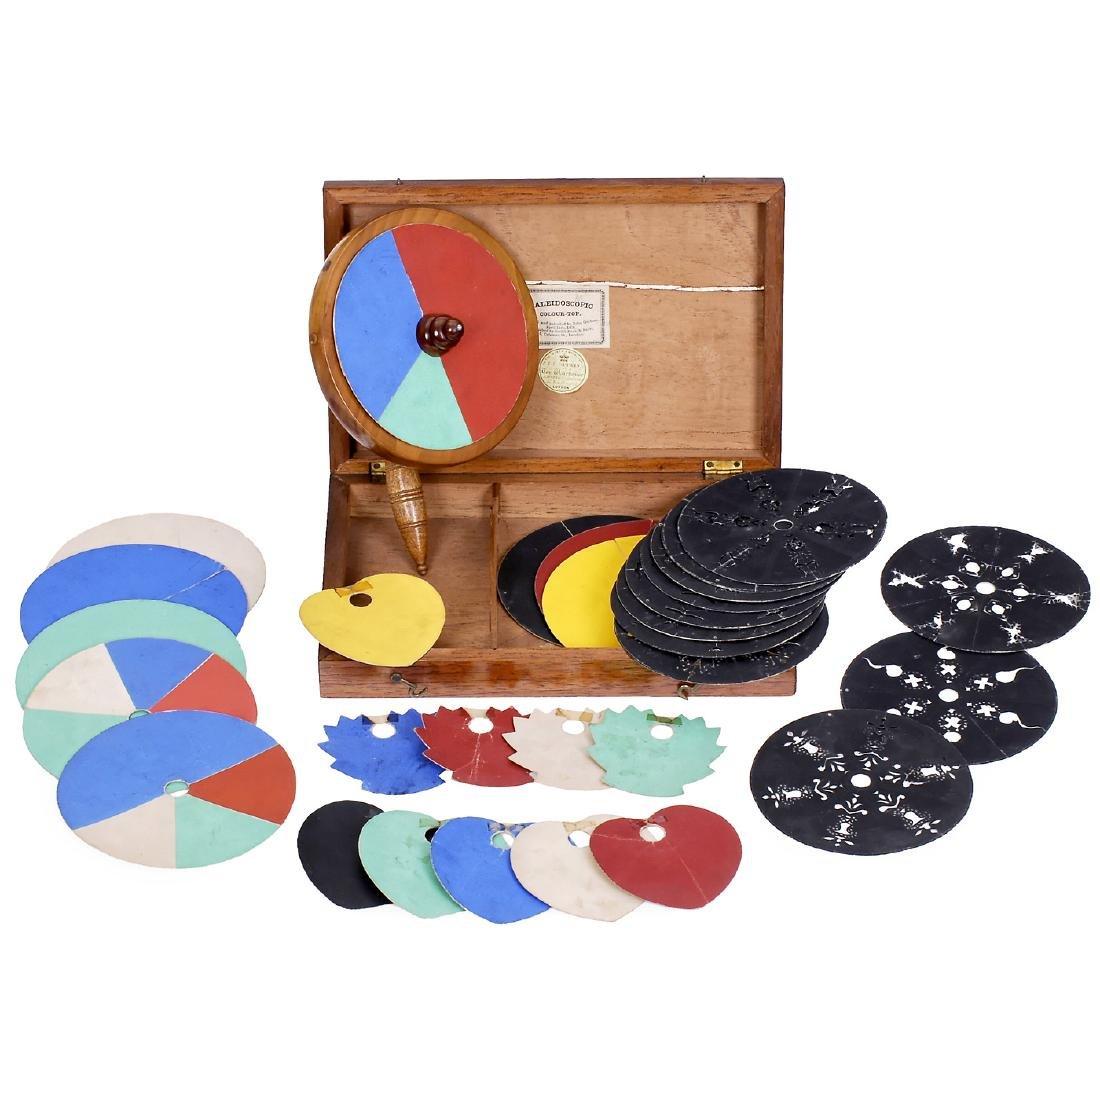 Kaleidoscopic Colour-Top, 1858